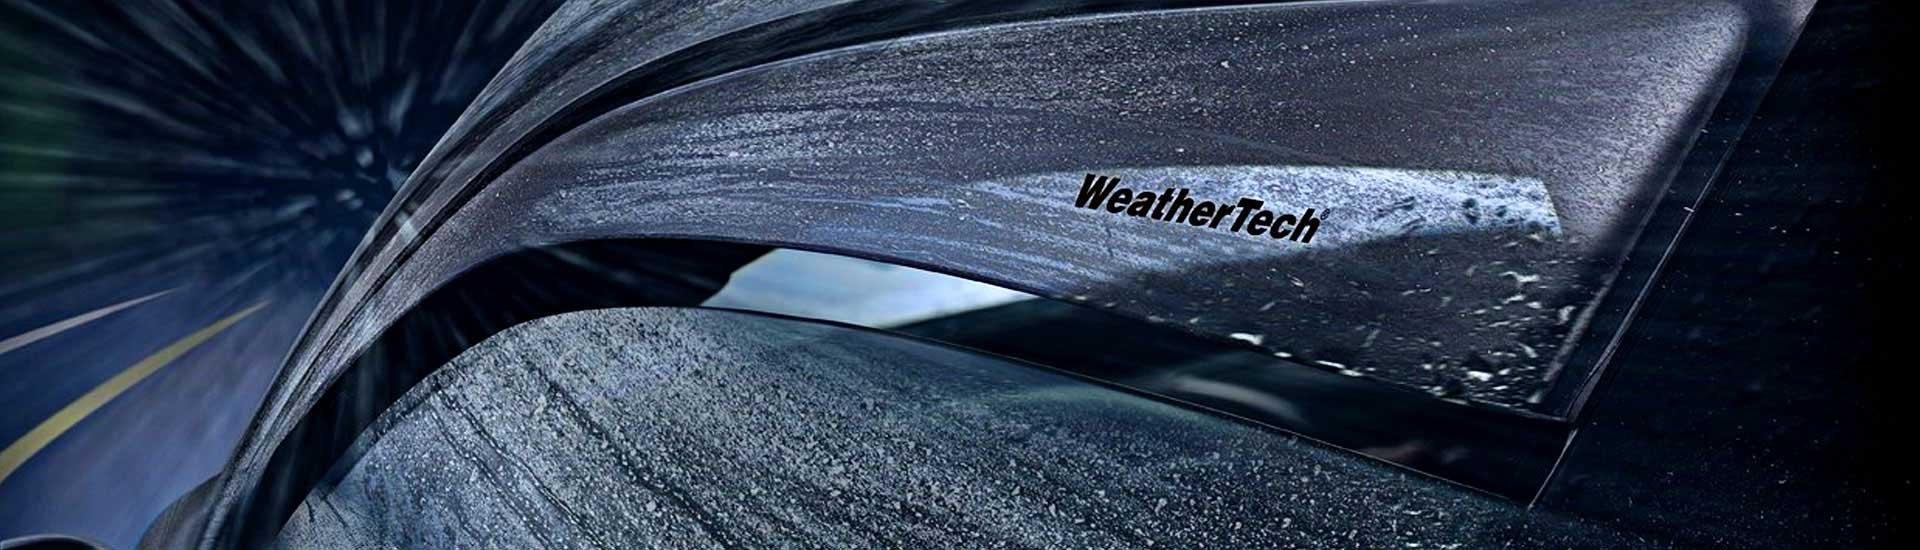 Rain Guards Wind Deflectors Window Visors At Carid Com